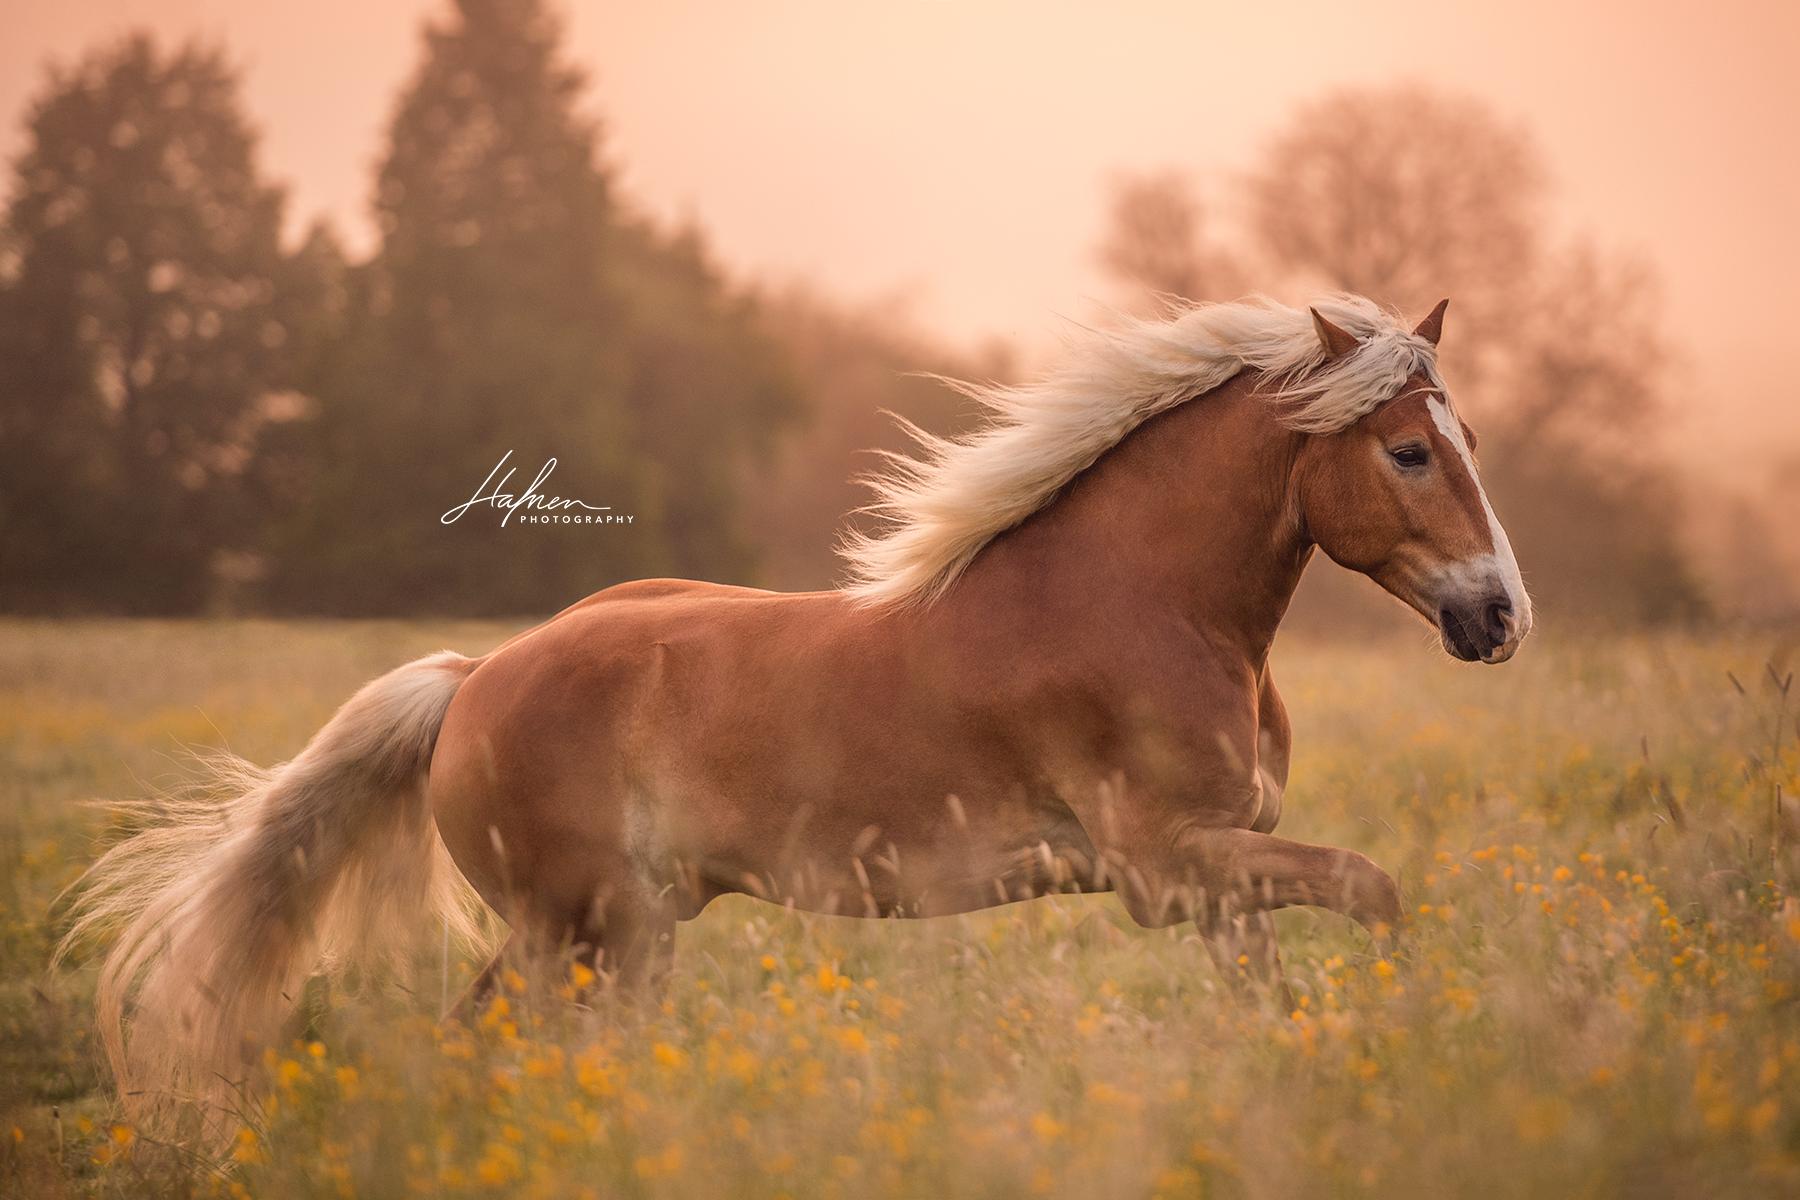 Haflinger Wallach Im Sonnenaufgang Pferd Bilder Foto Fotografie Fotoshooting Pferdefotografie Pferd Pferde Fotografie Pferde Bilder Pferdefotos